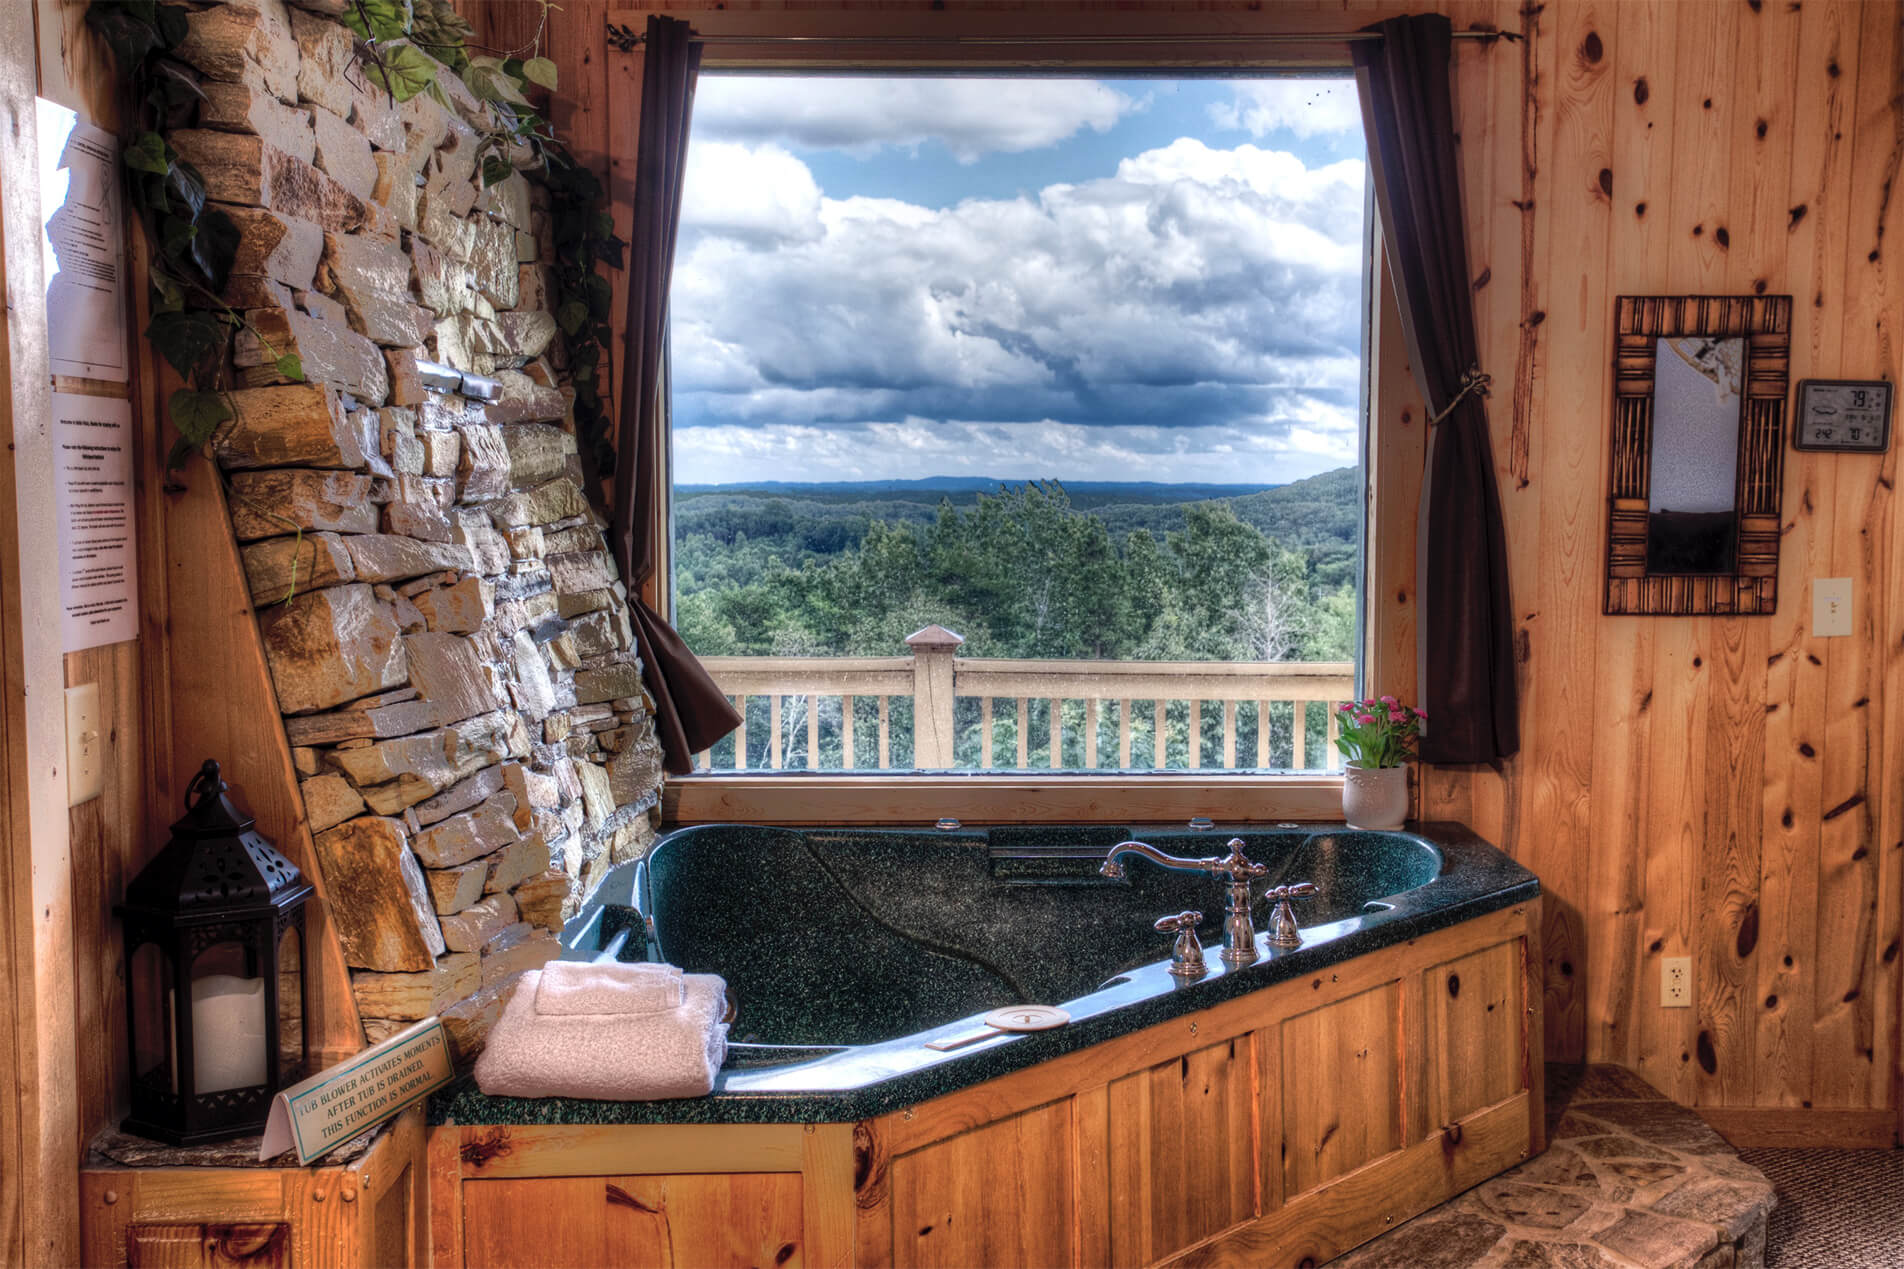 Bella Vista Window View Inside Cabin